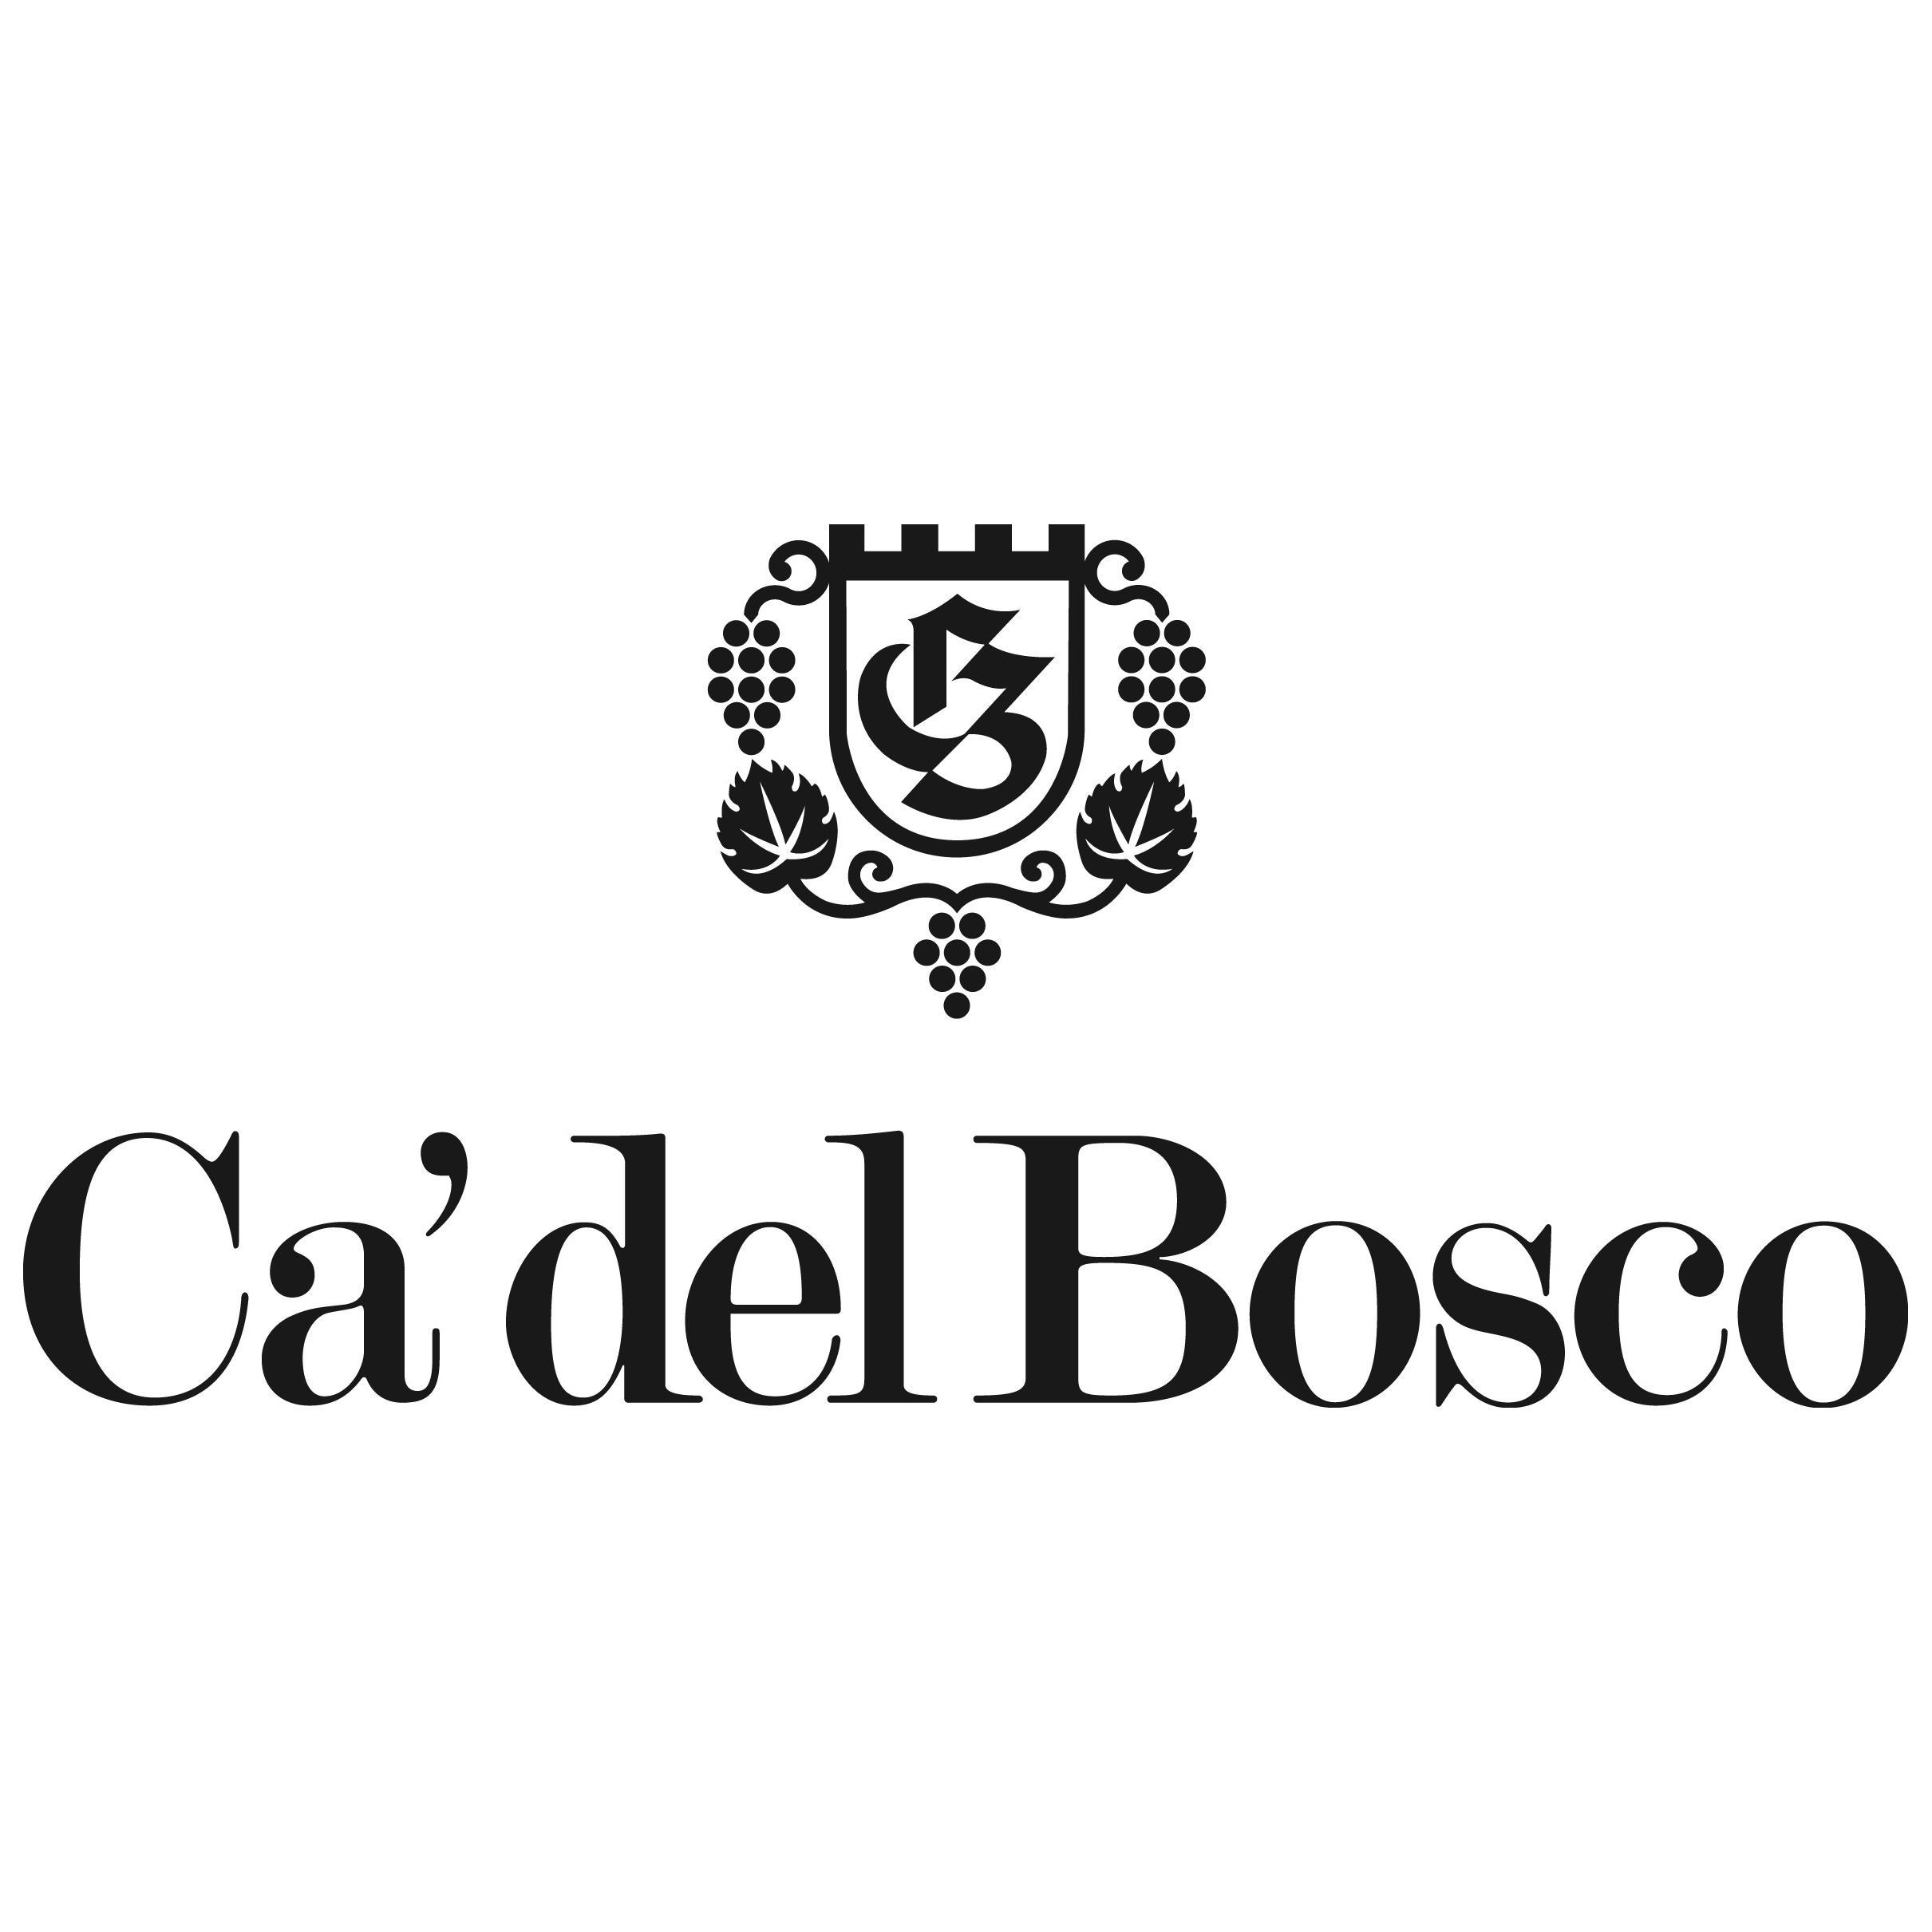 Rigoni, Cà del Bosco, Distributore, Vino, Horeca